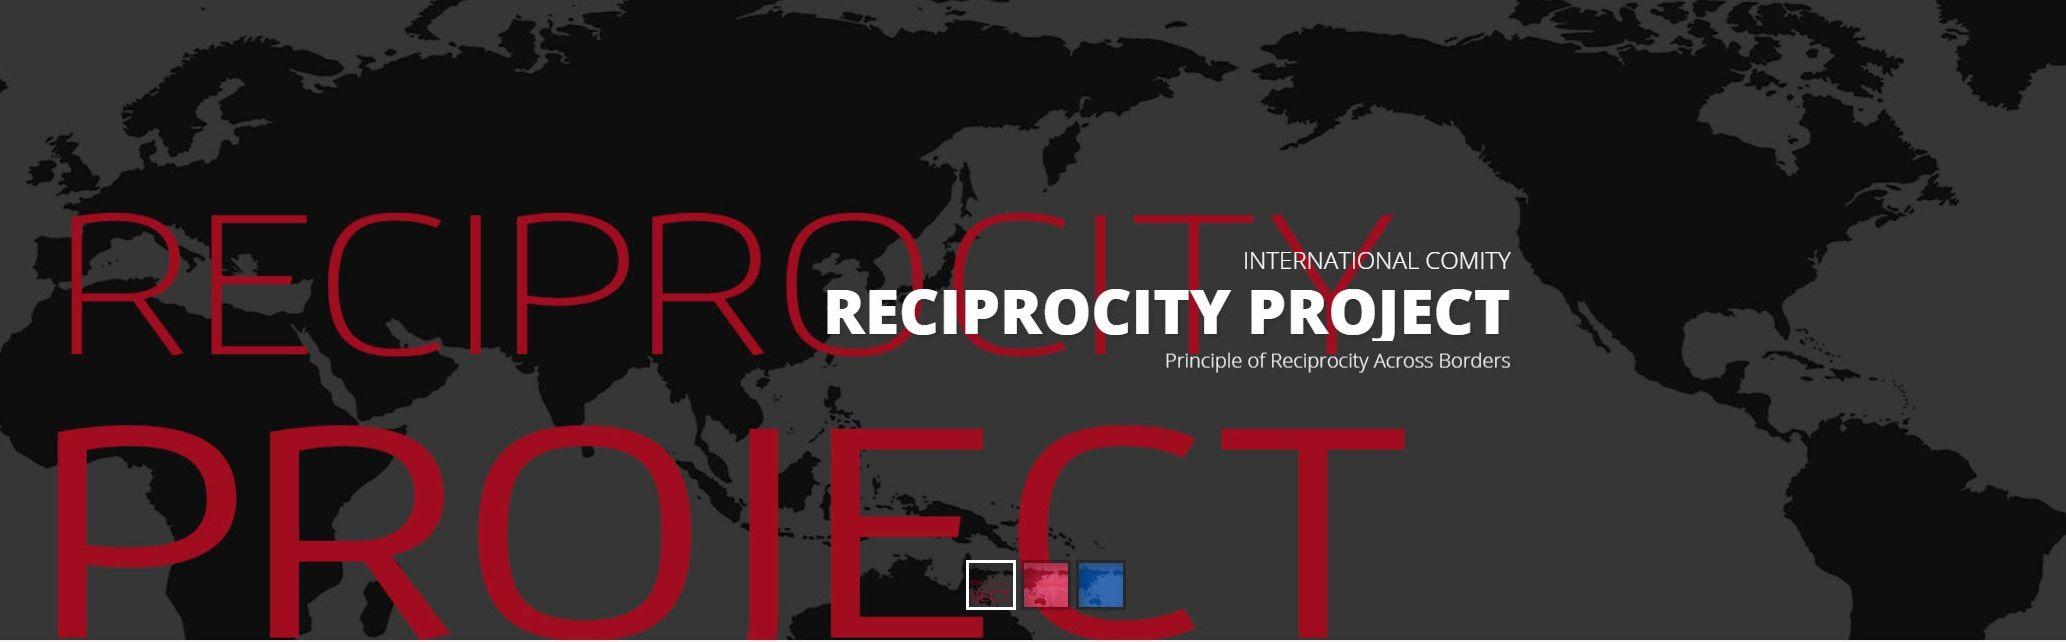 Reciprocity Project Logo